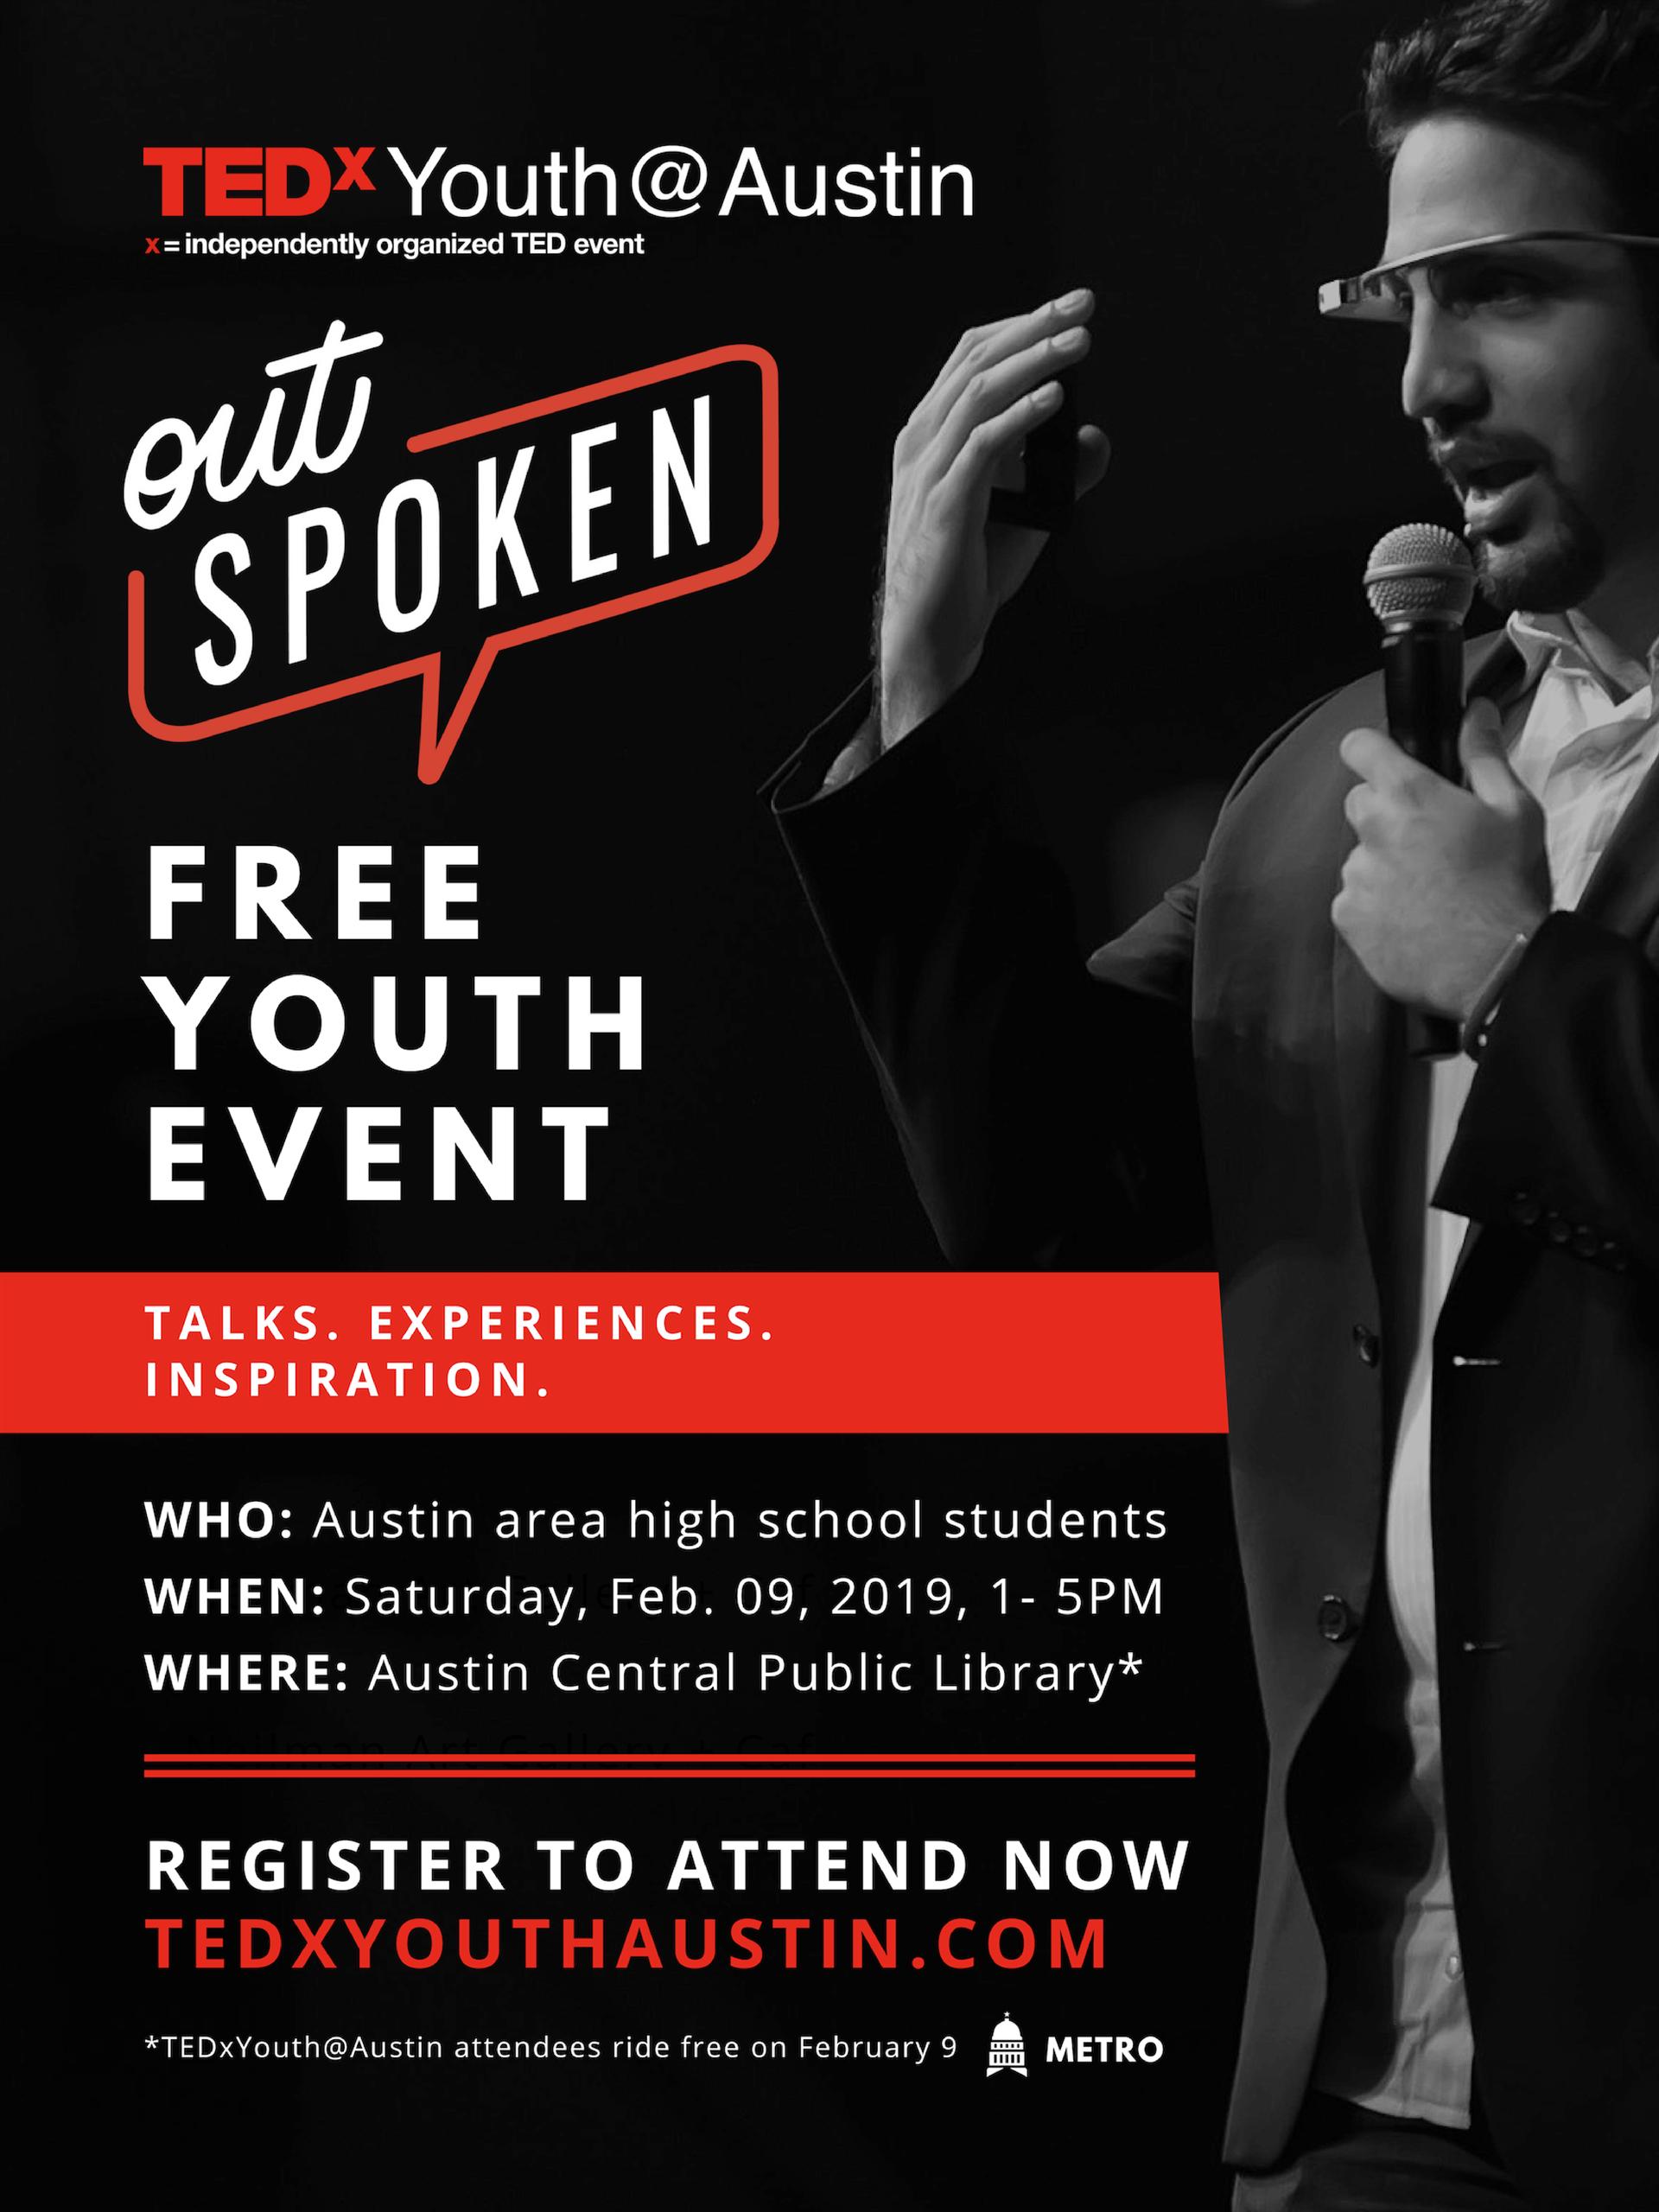 TEDX Youth Austin